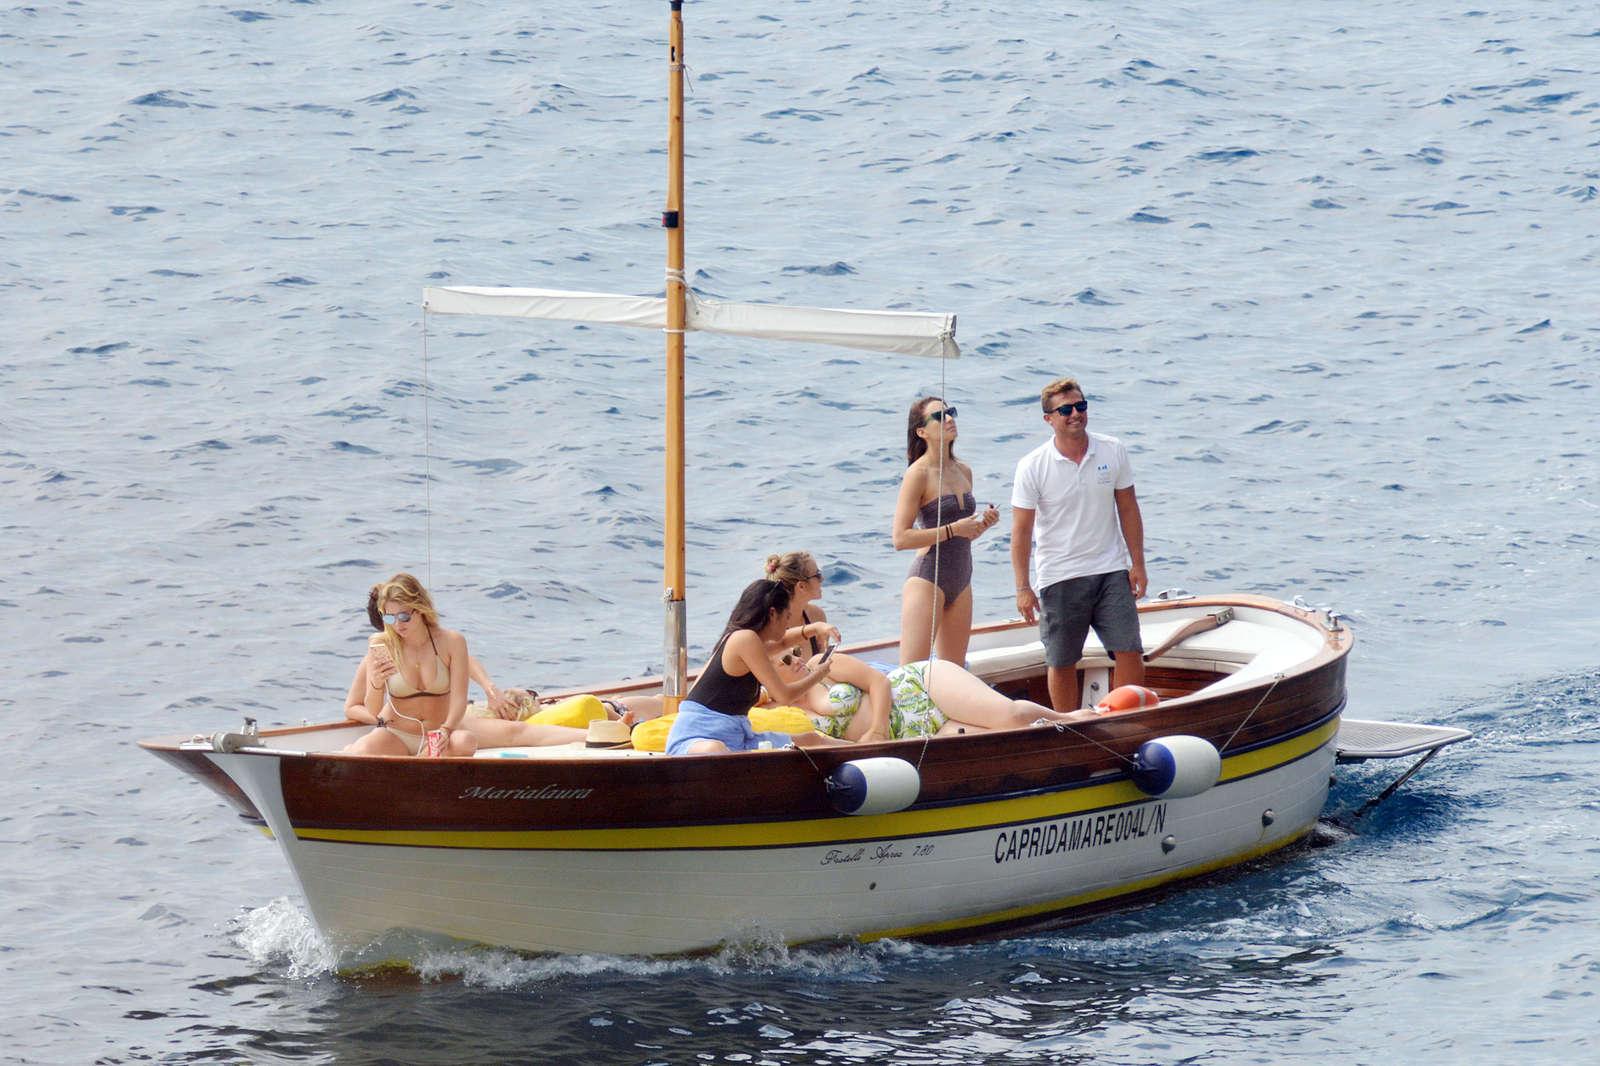 Ashley Benson 2016 : Ashley Benson, Shay Mitchell and Troian Bellisario on a boat in Capri -31